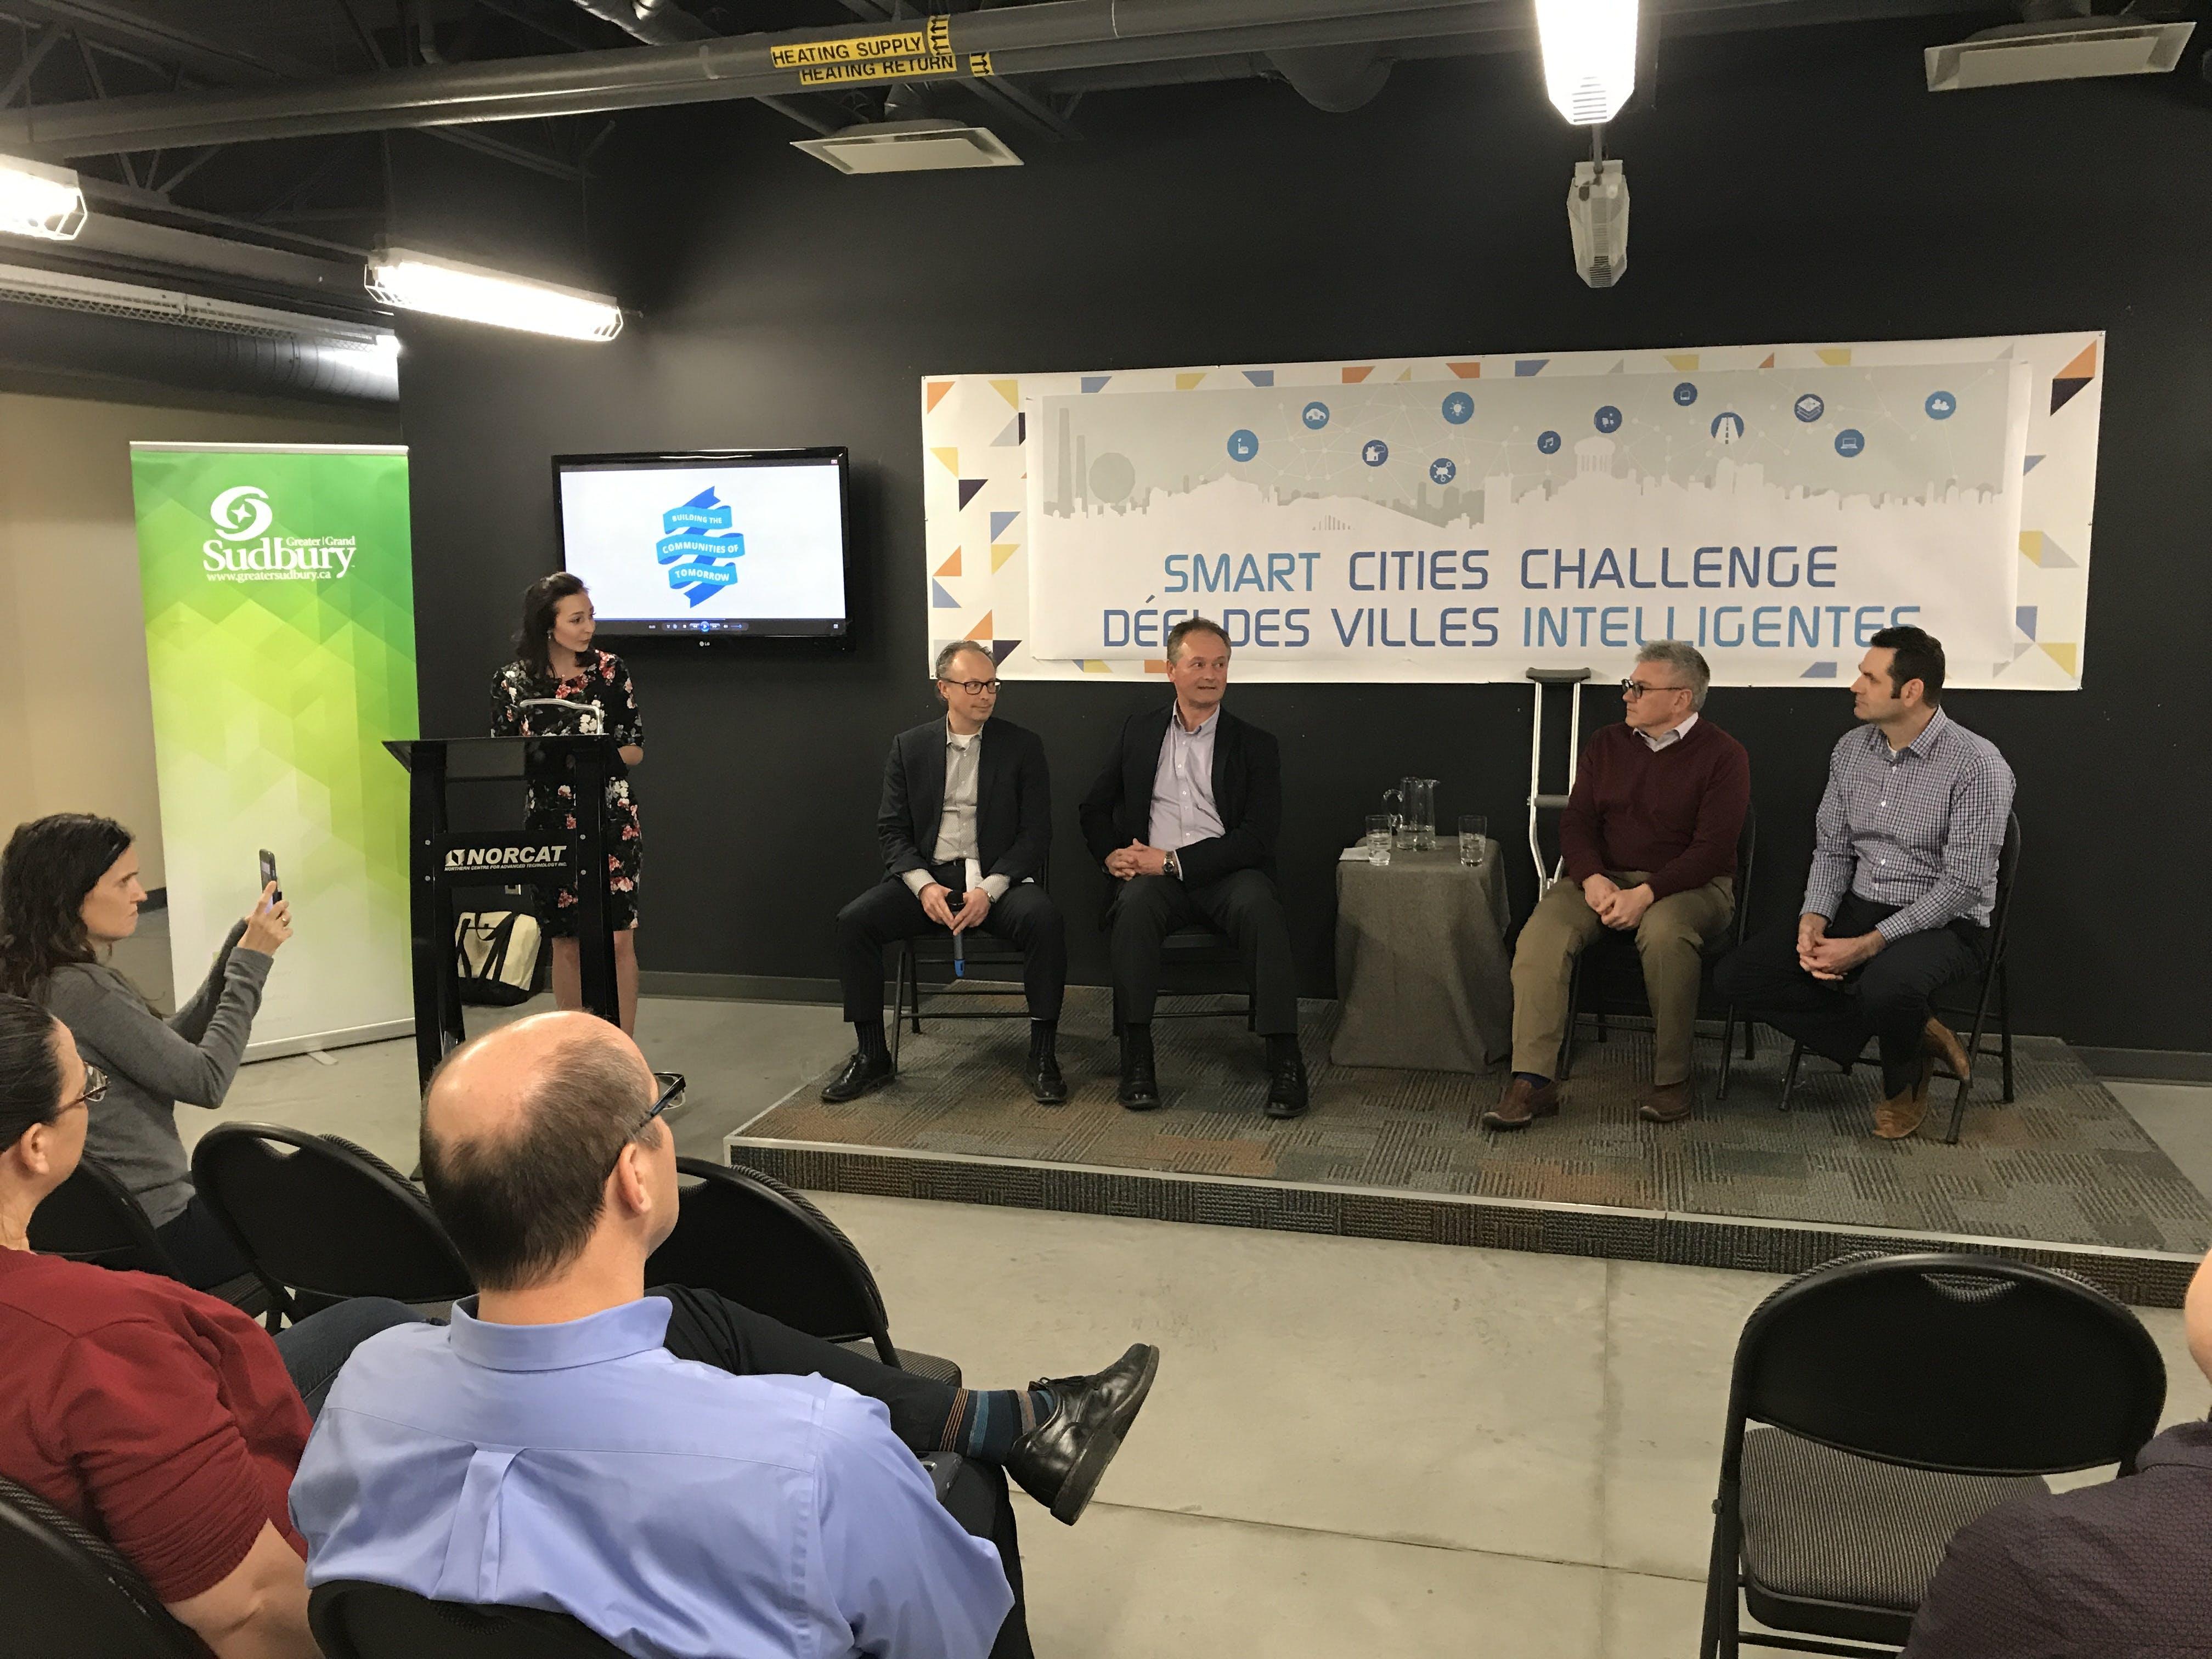 Smart Cities Panel Talk